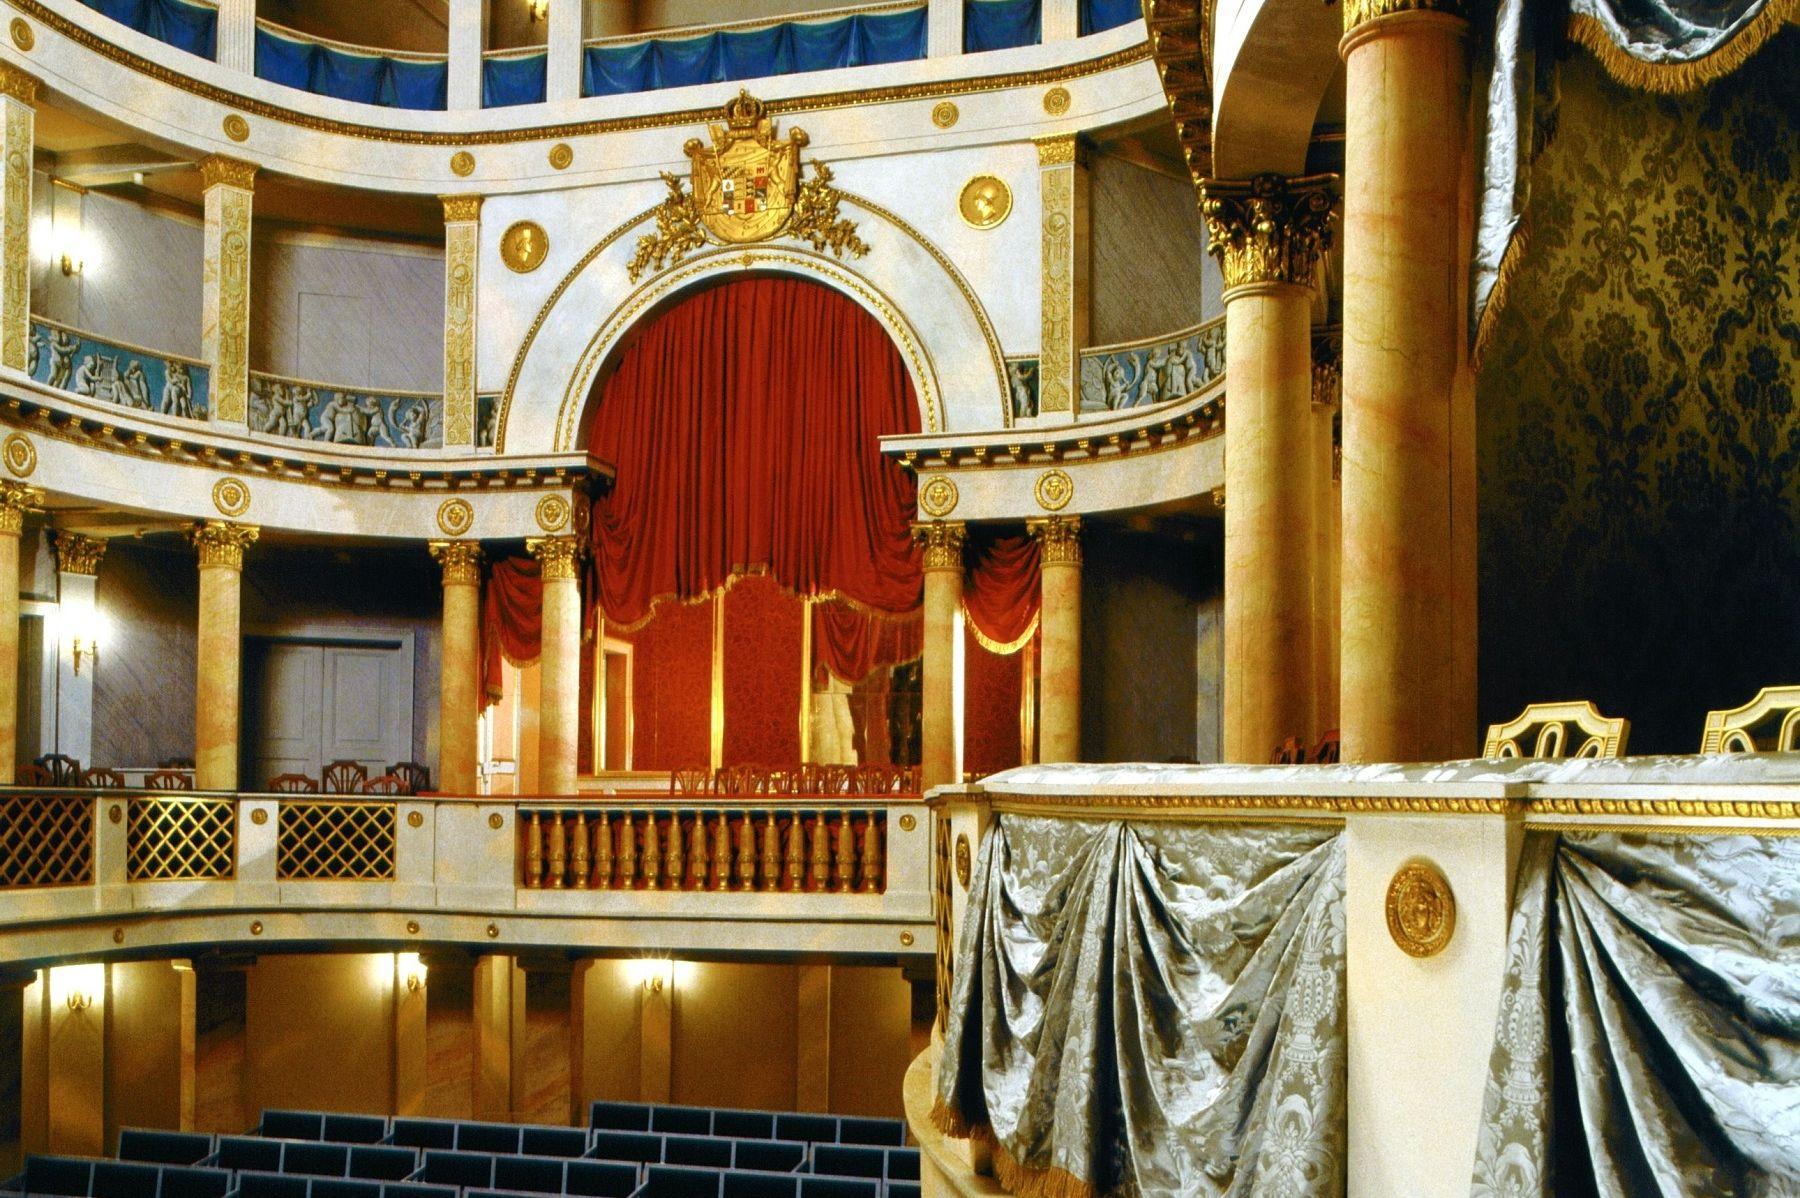 Blick ins Schlosstheater, Residenzschloss Ludwigsburg